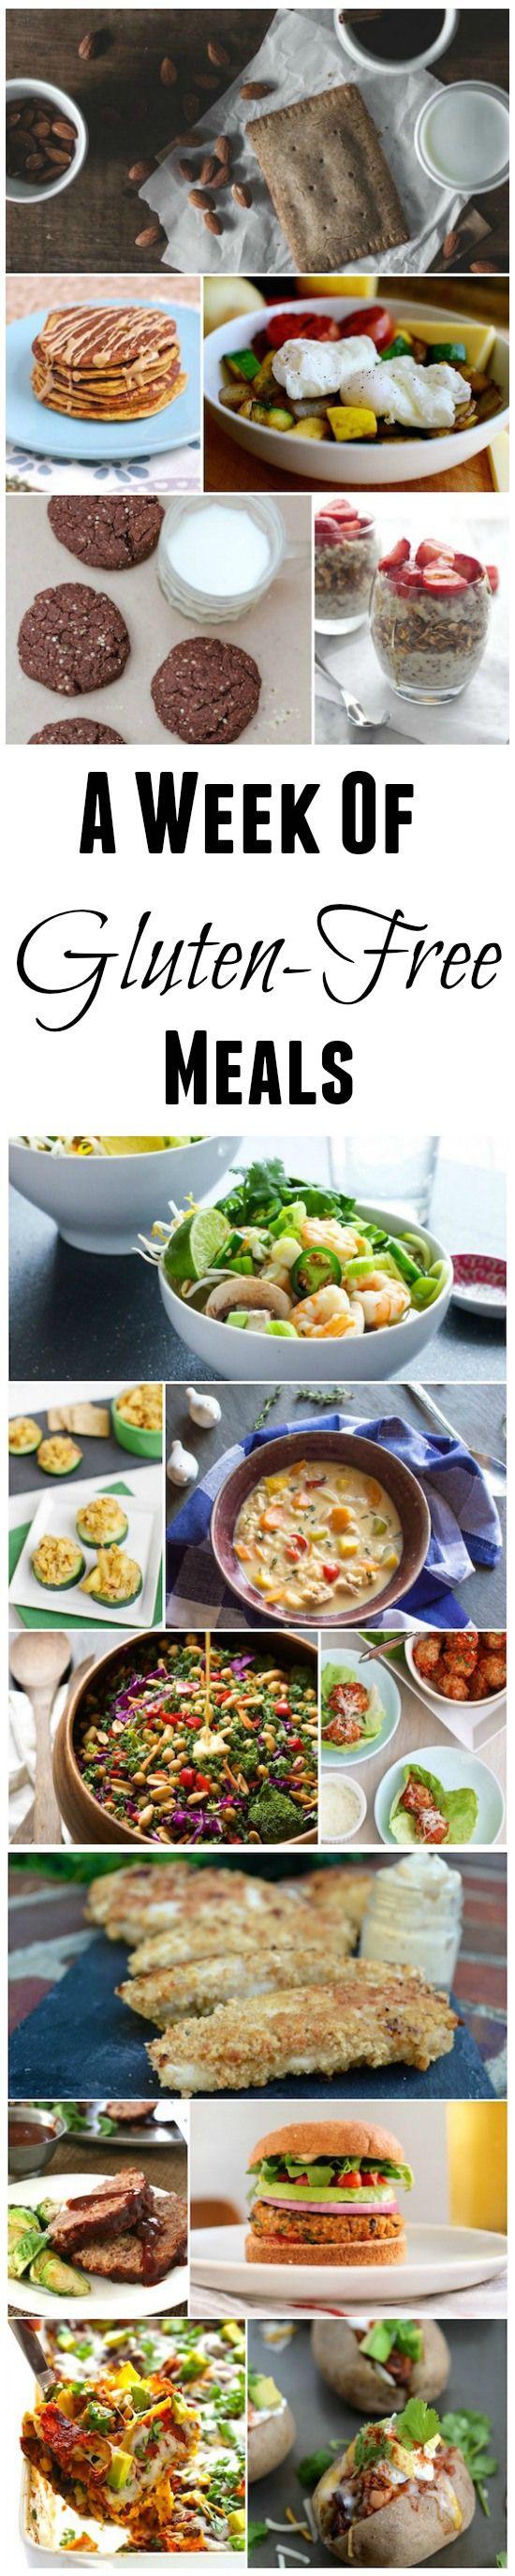 Sunday Food Prep Inspiration 104